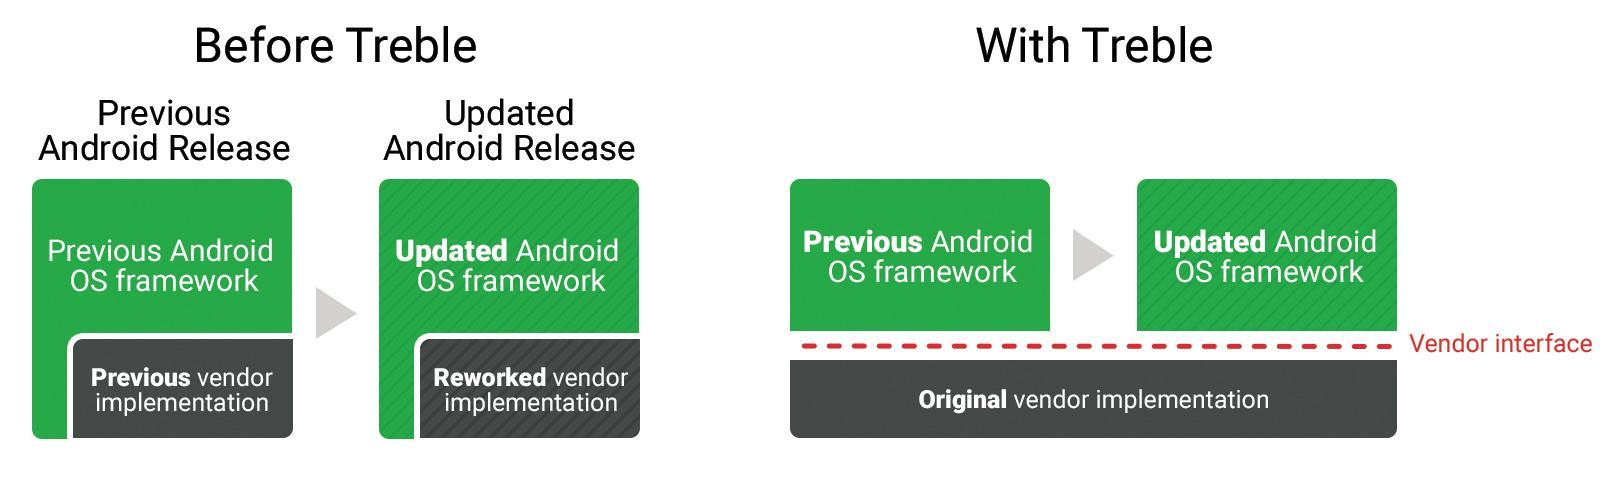 Samsung Galaxy S9: schnellere Updates dank Project Treble? techboys.de • smarte News, auf den Punkt!